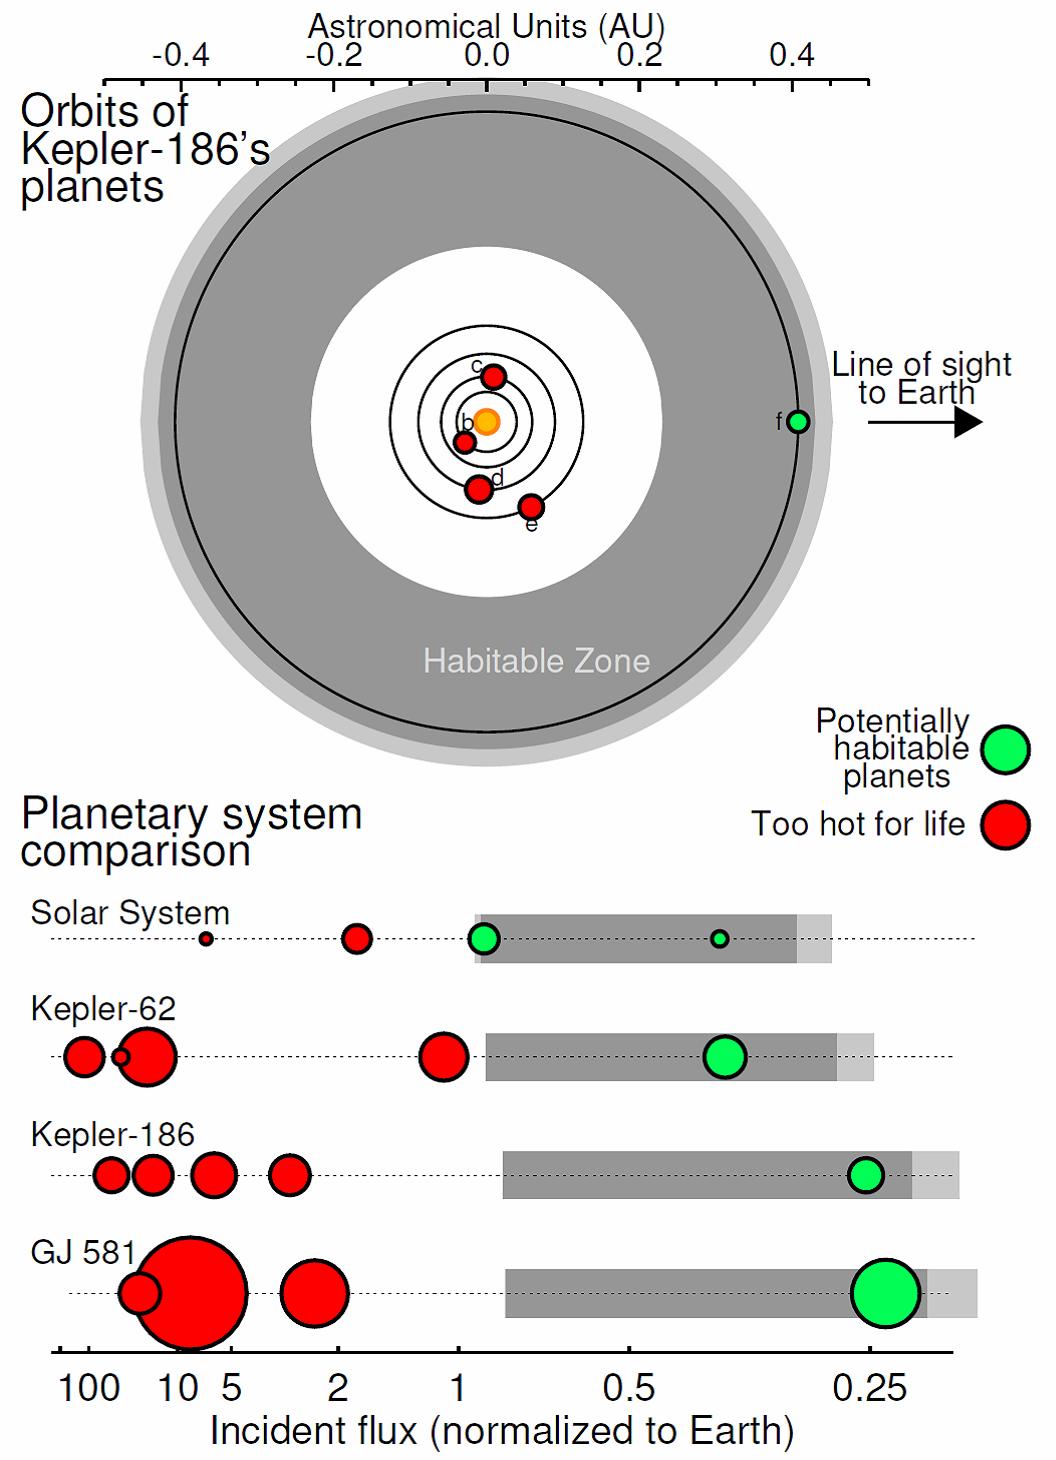 Beyond Earthly Skies: Habitability of Kepler-186f